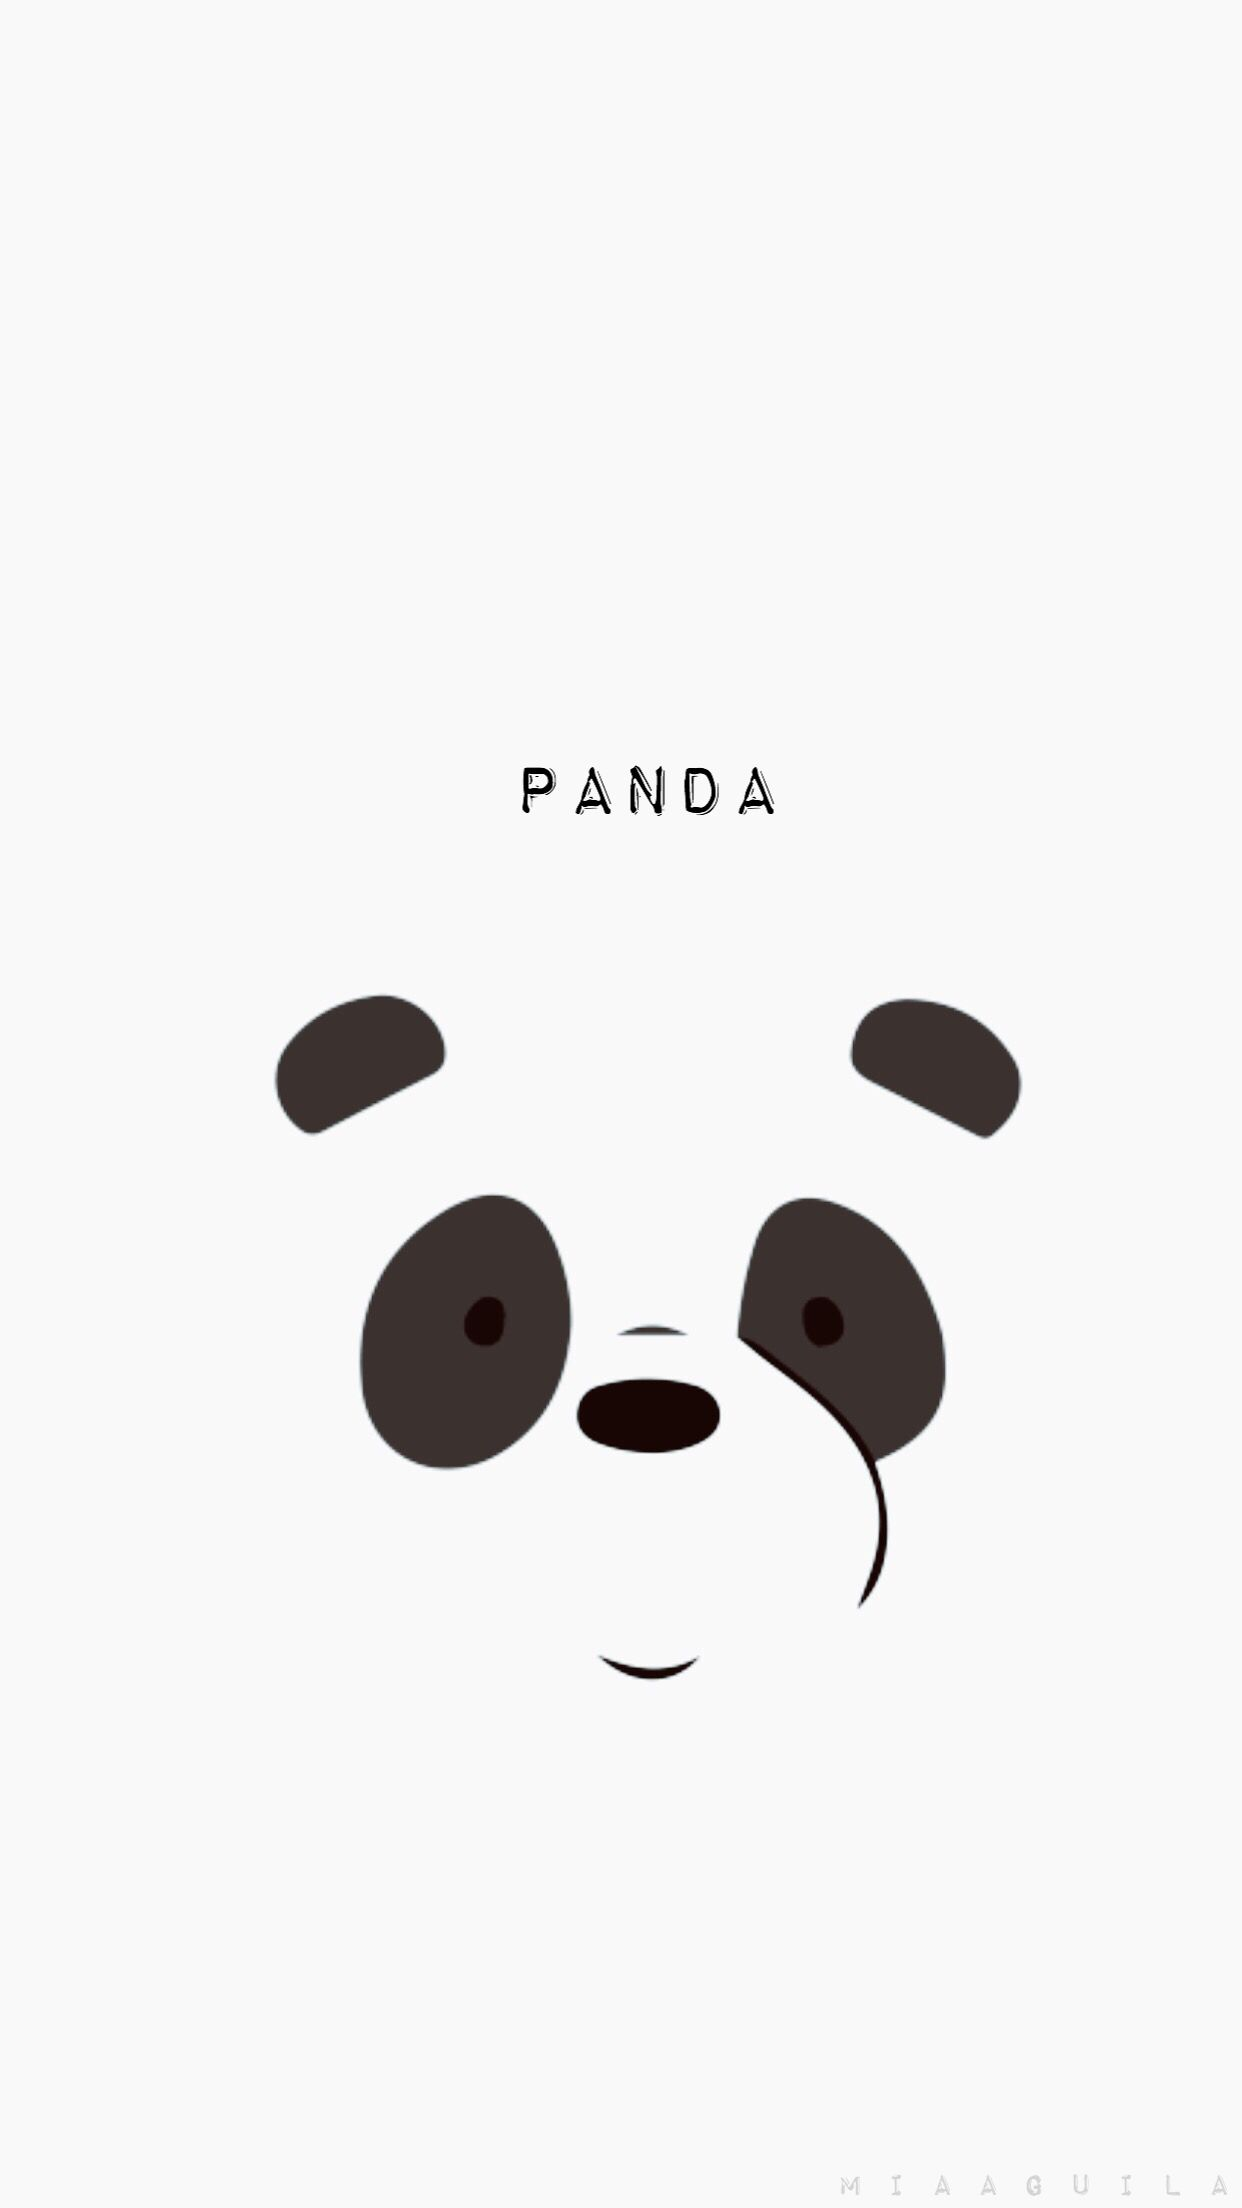 Y Yo Que Me Voy Duvar Kaitlari T Panda